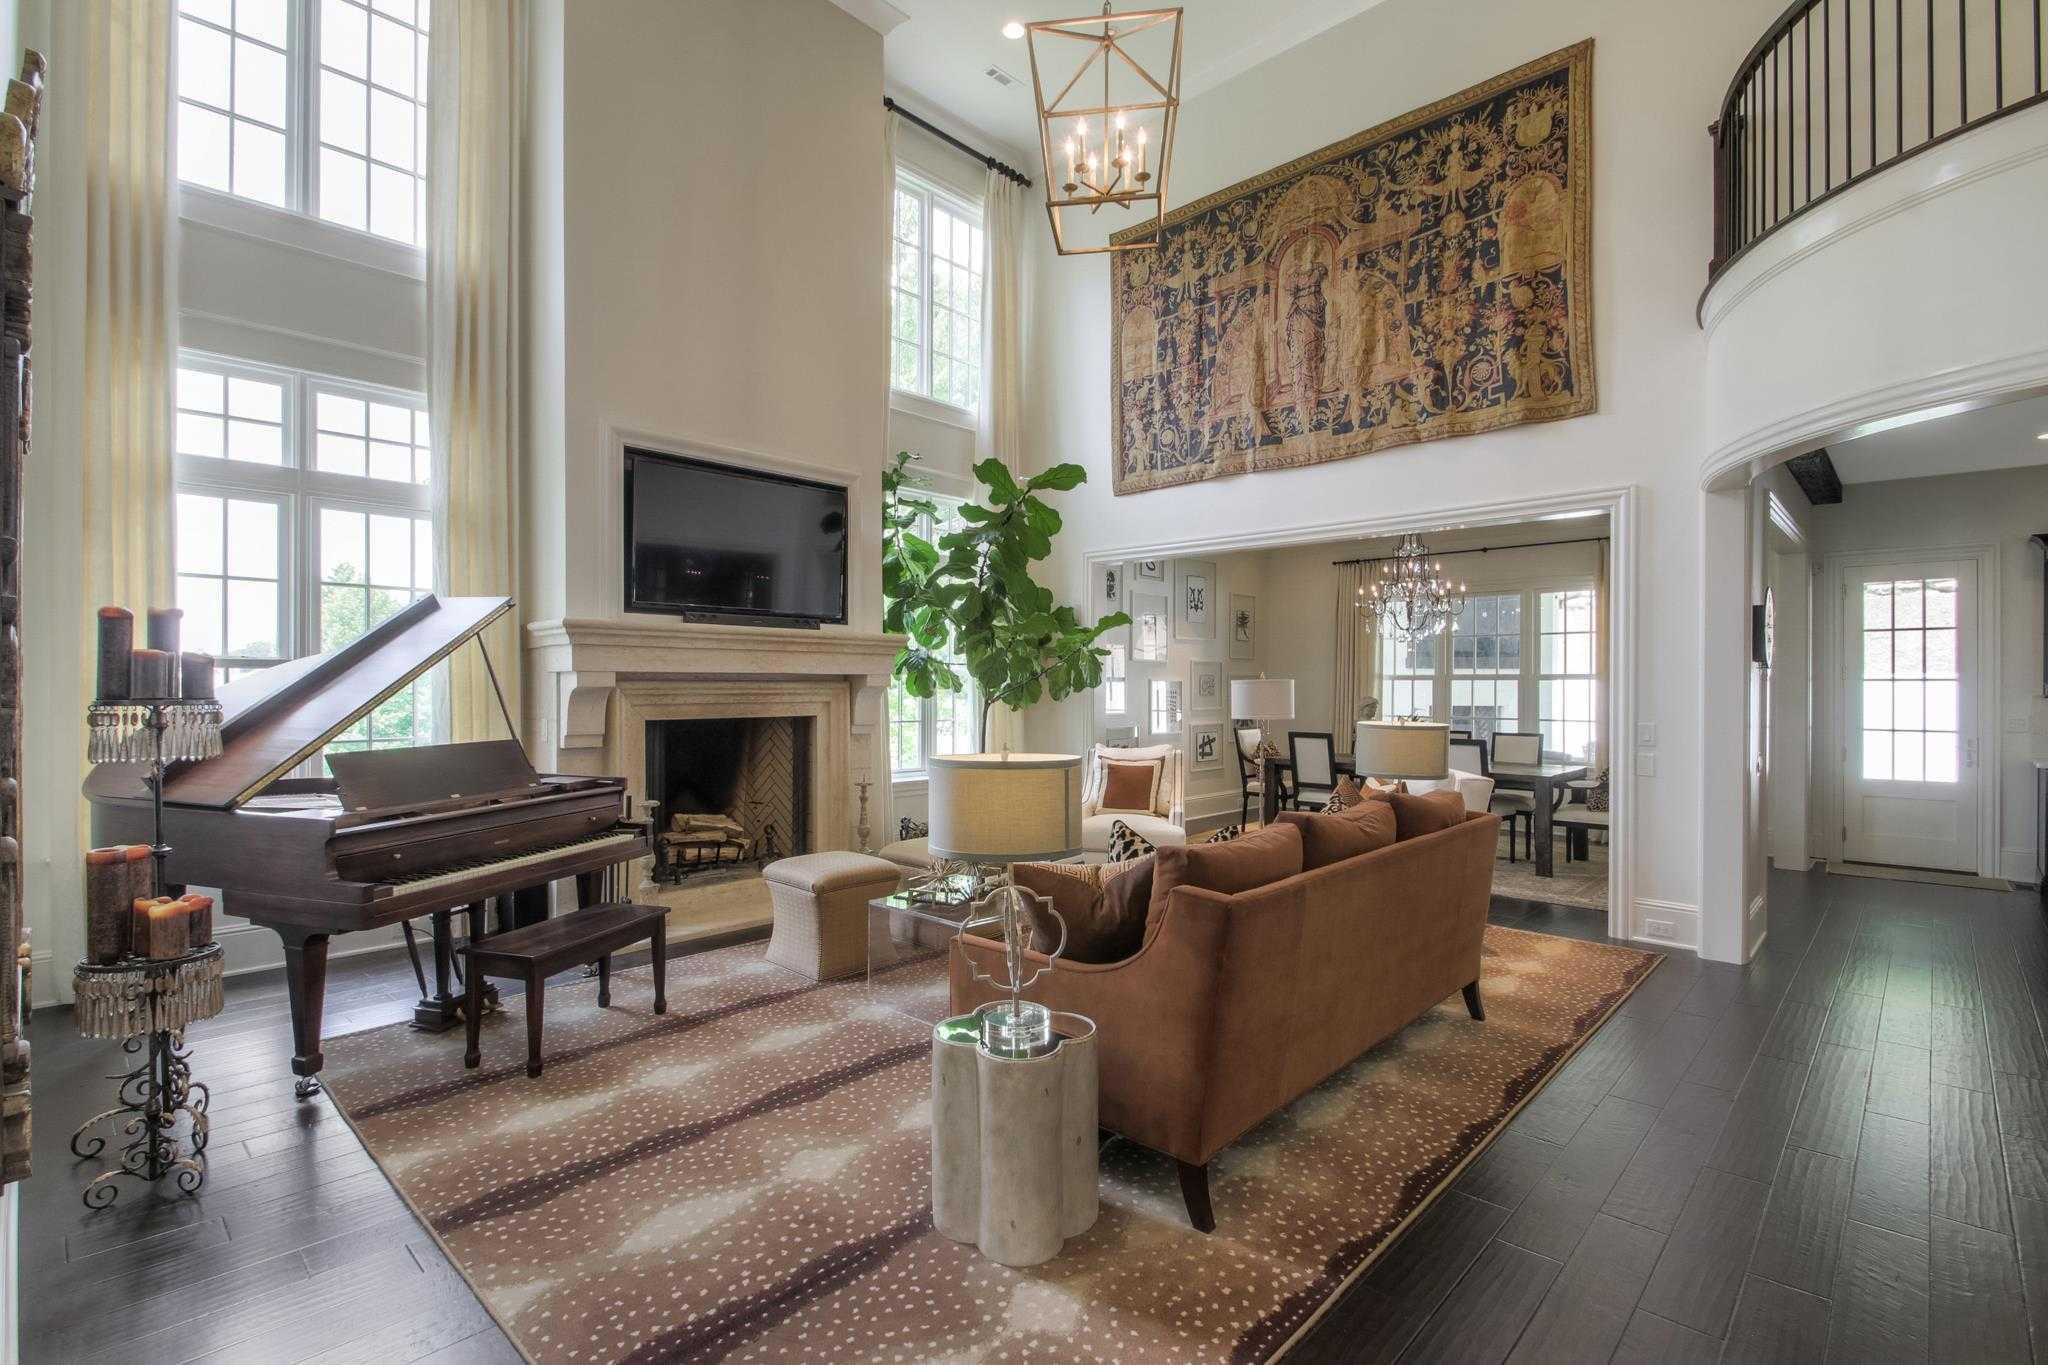 $1,499,000 - 5Br/7Ba -  for Sale in Avalon Sec 3, Franklin